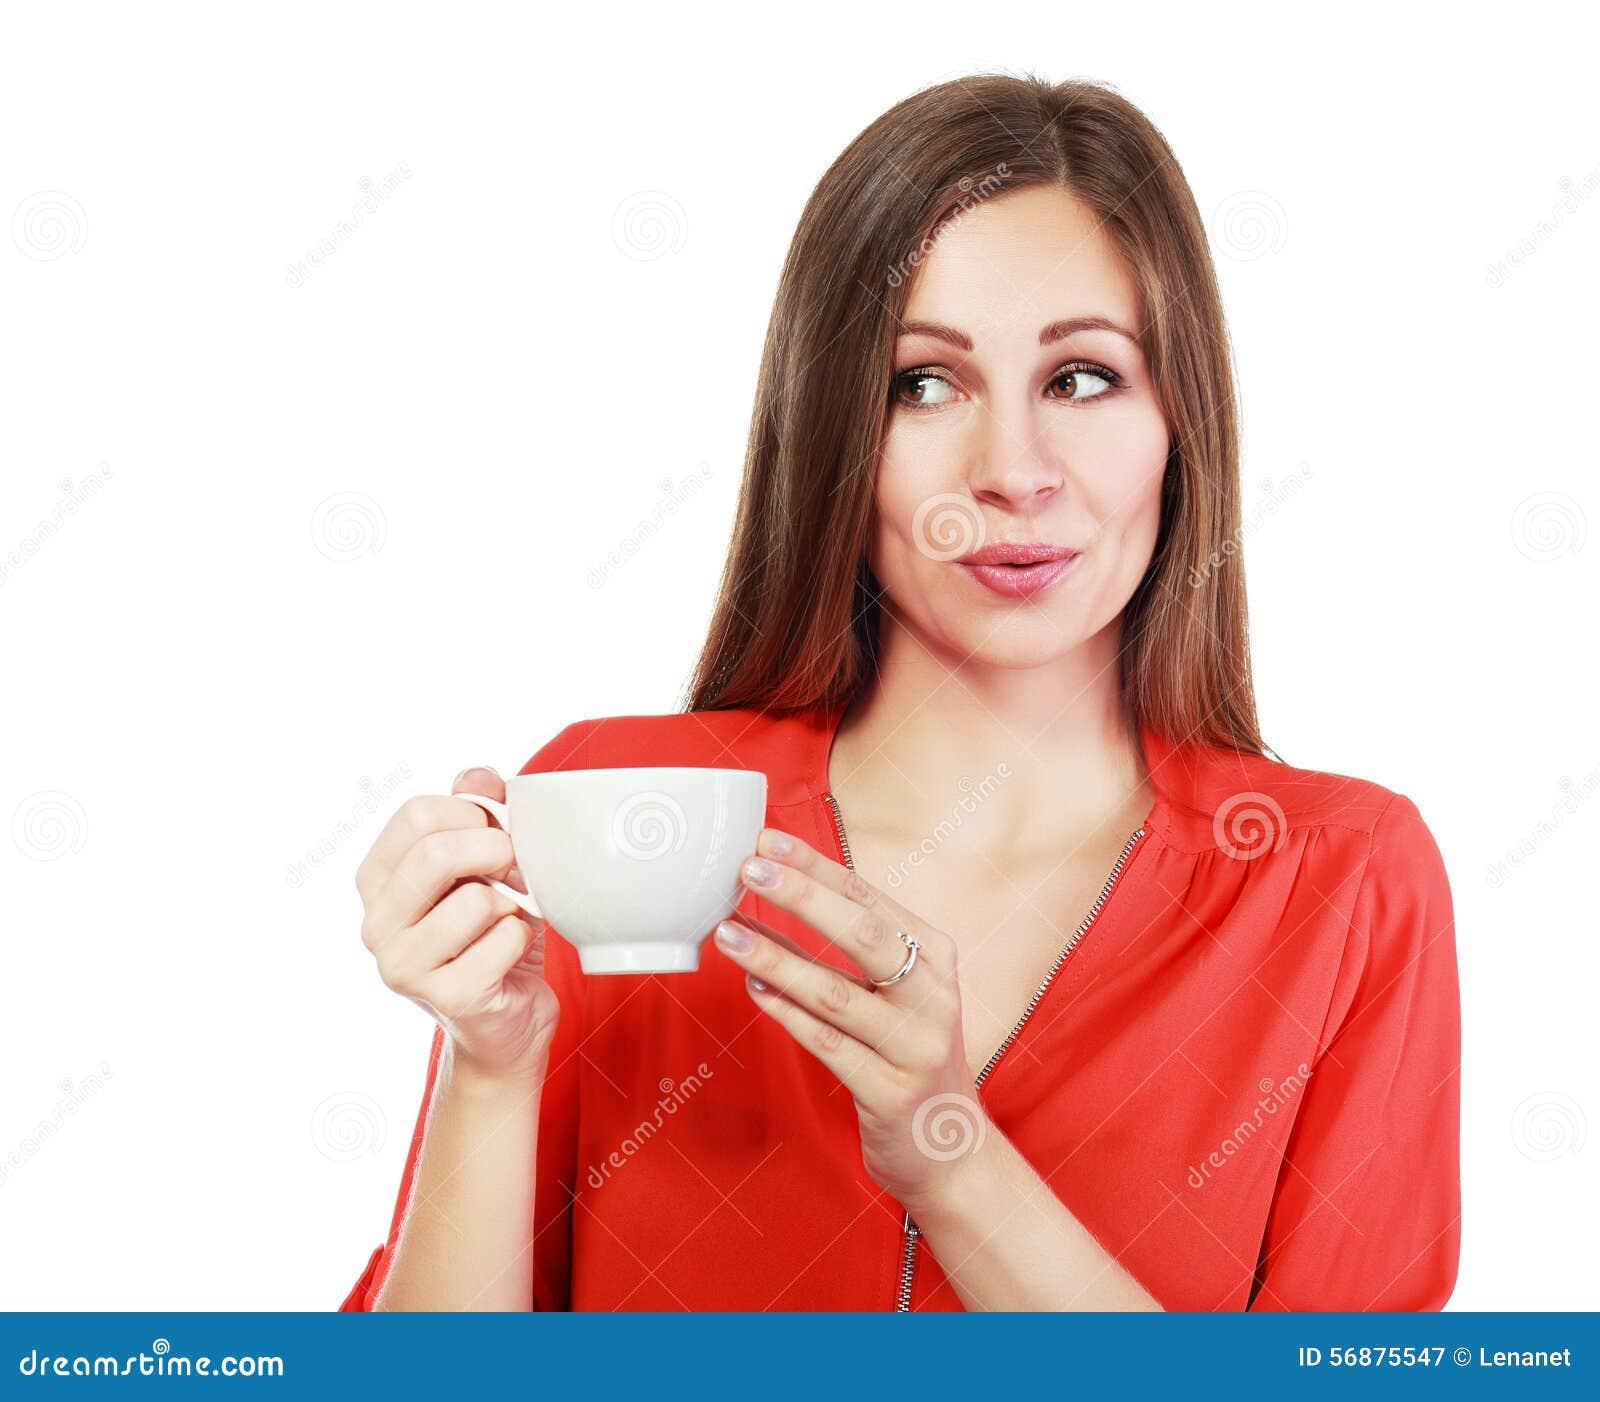 Woman coffee cup